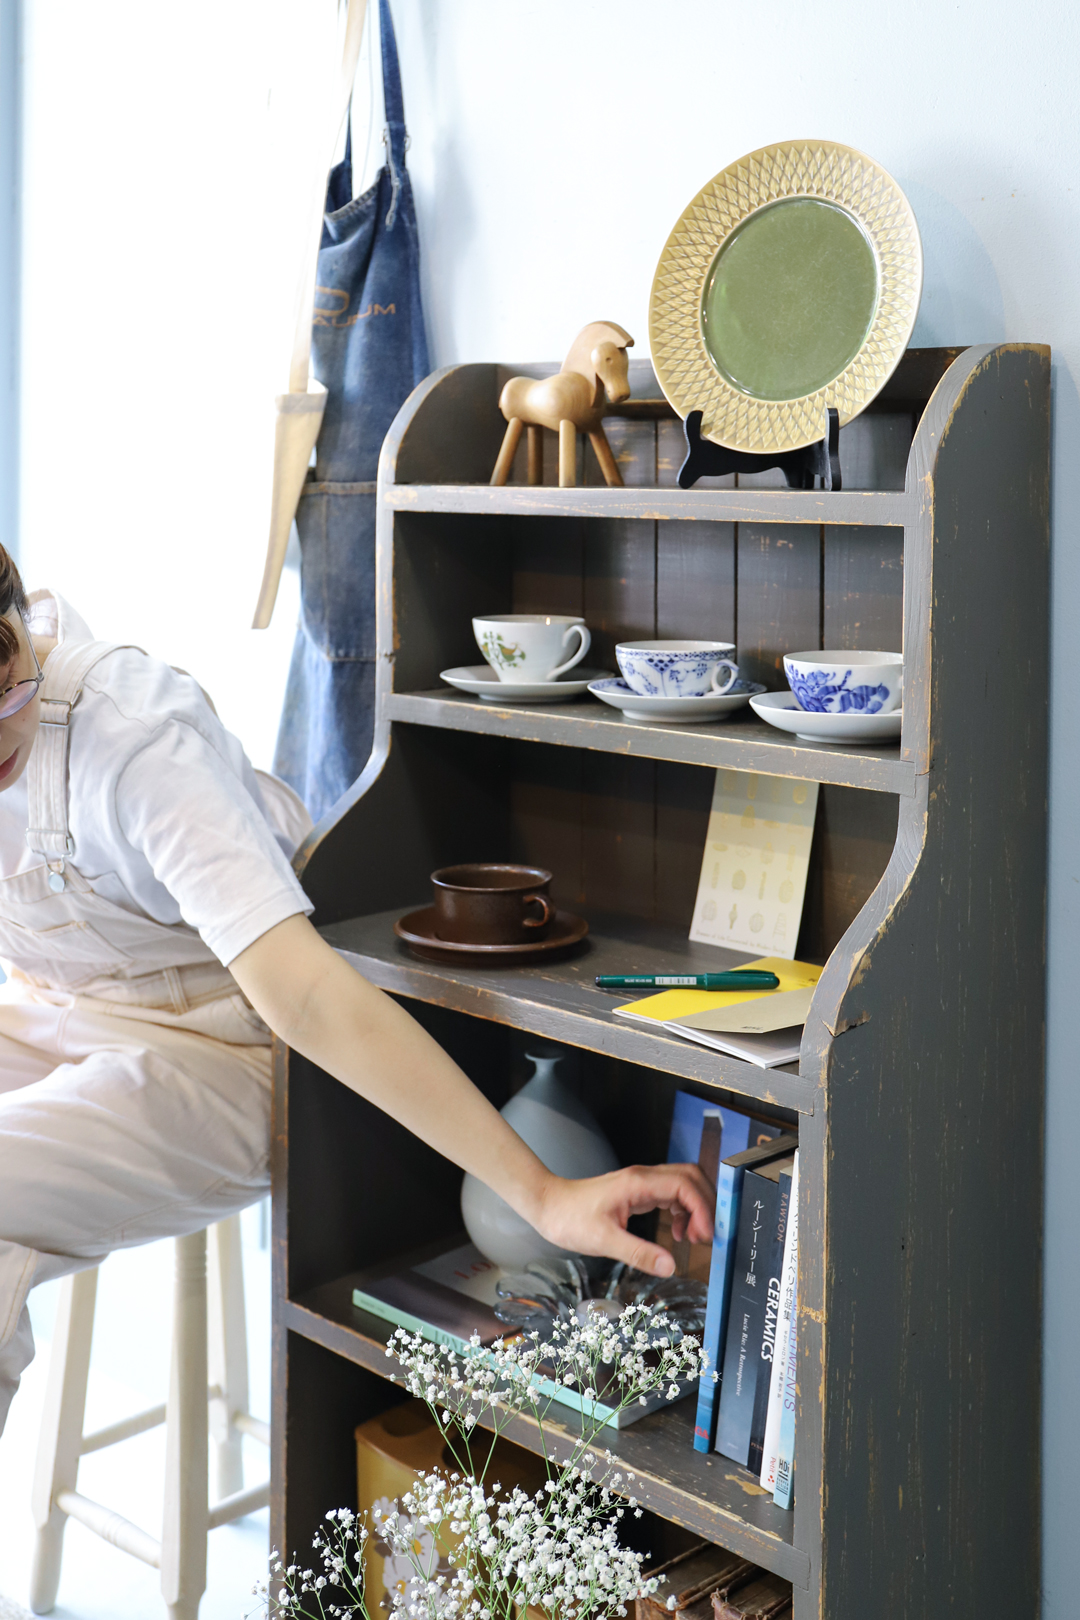 French Shabby Chic Style Vintage Book Shelf/ヴィンテージ ブックシェルフ フレンチカントリー シャビーシック 本棚